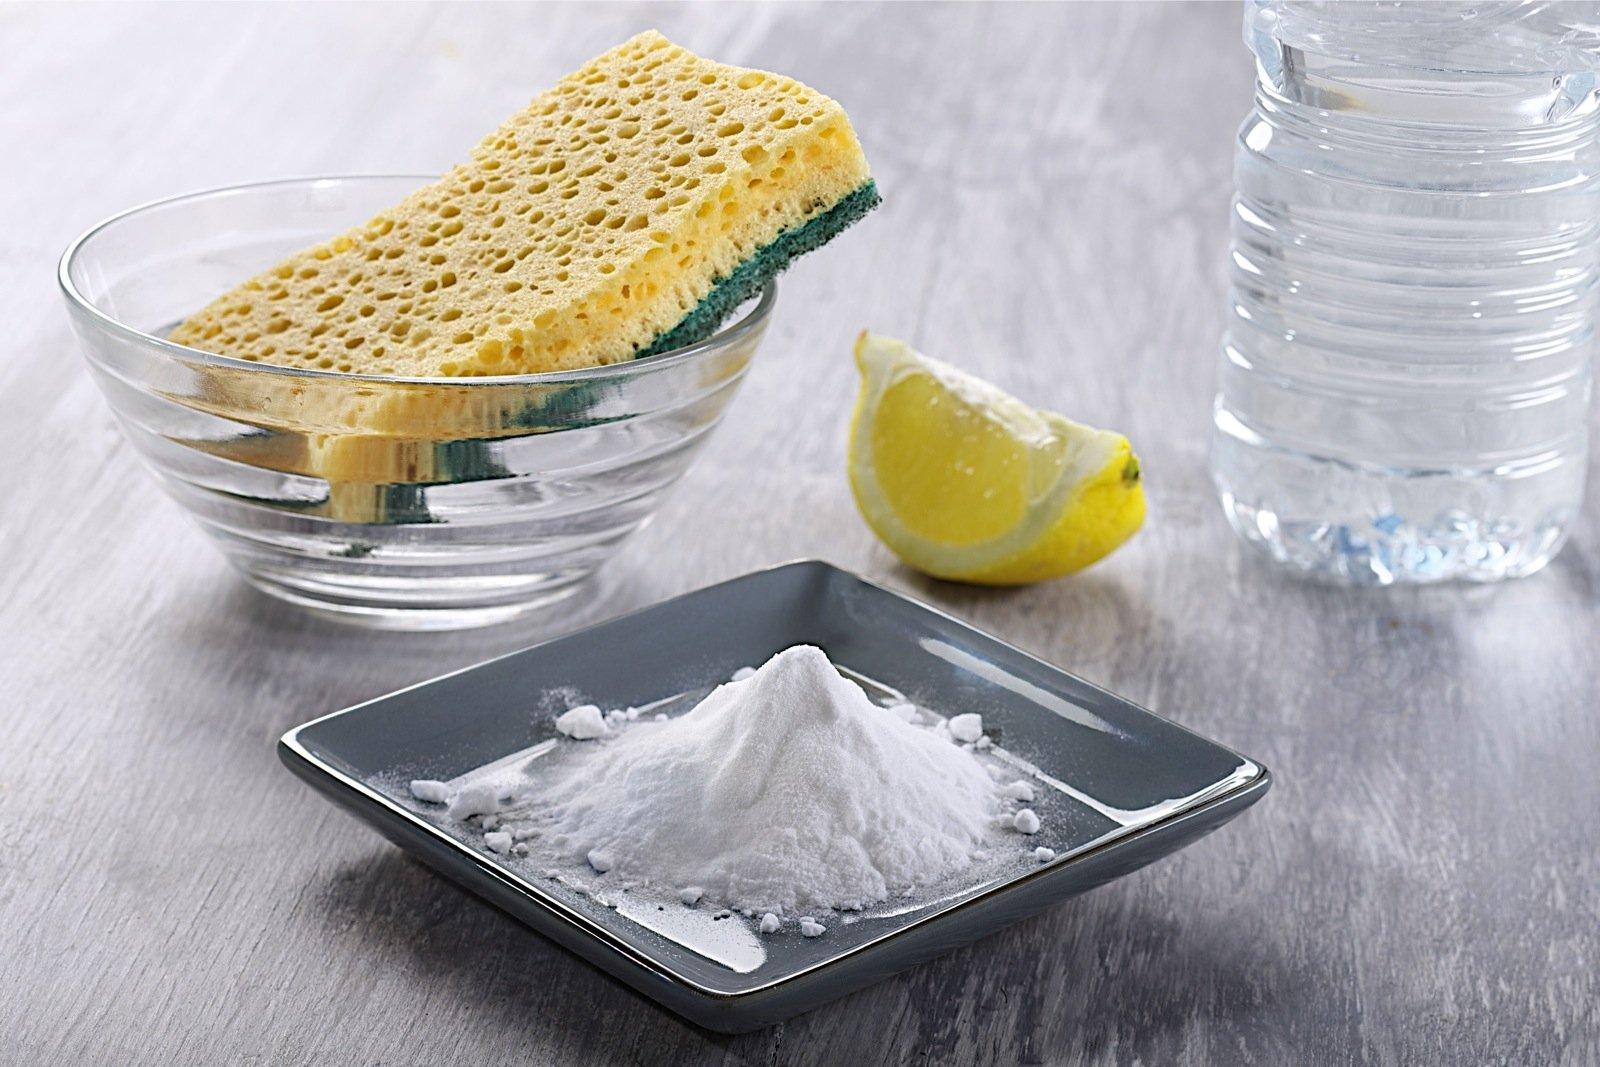 kas sooda vesi puruneb rasva